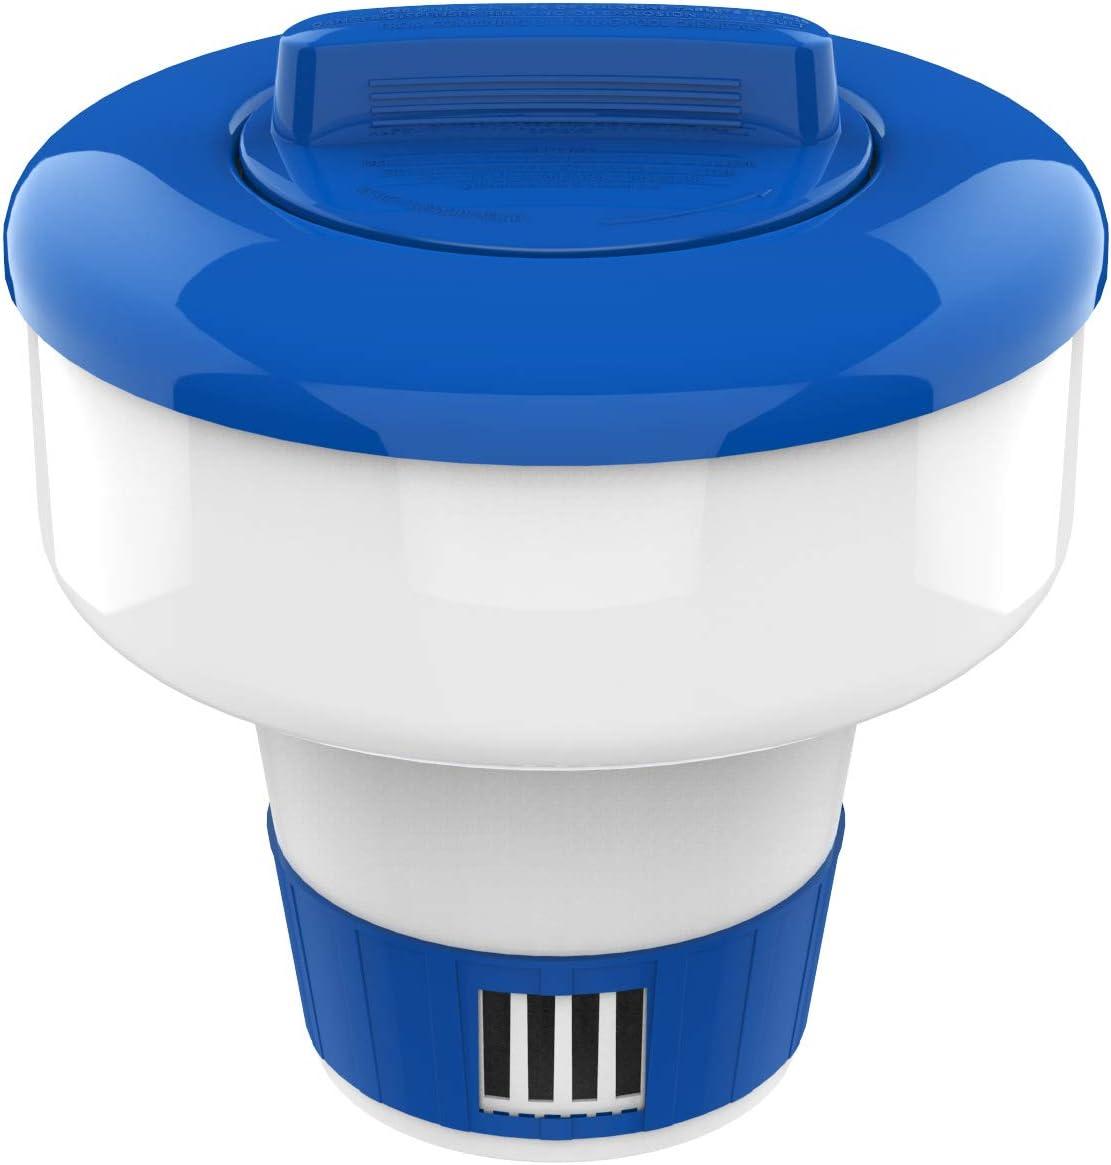 Housolution Award 7-inch Floating Chlorine Large Dispenser Cheap Capacity-F